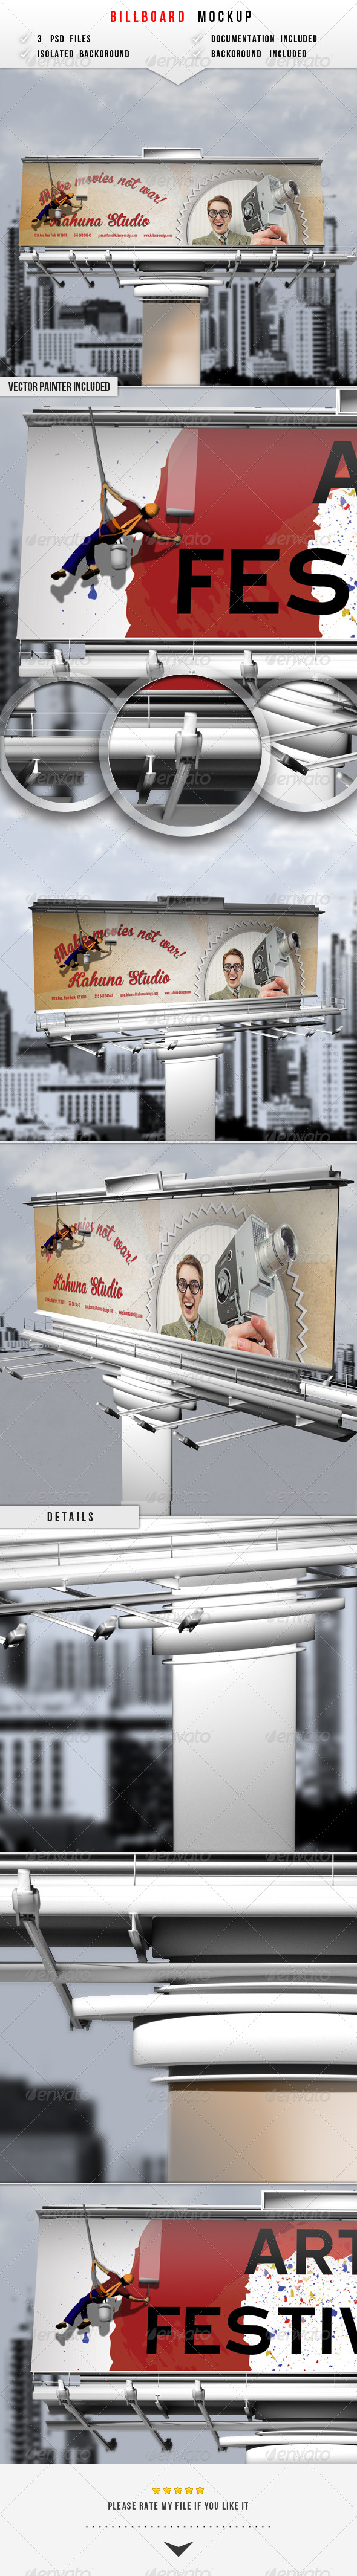 GraphicRiver Billboard Mockup 6274939